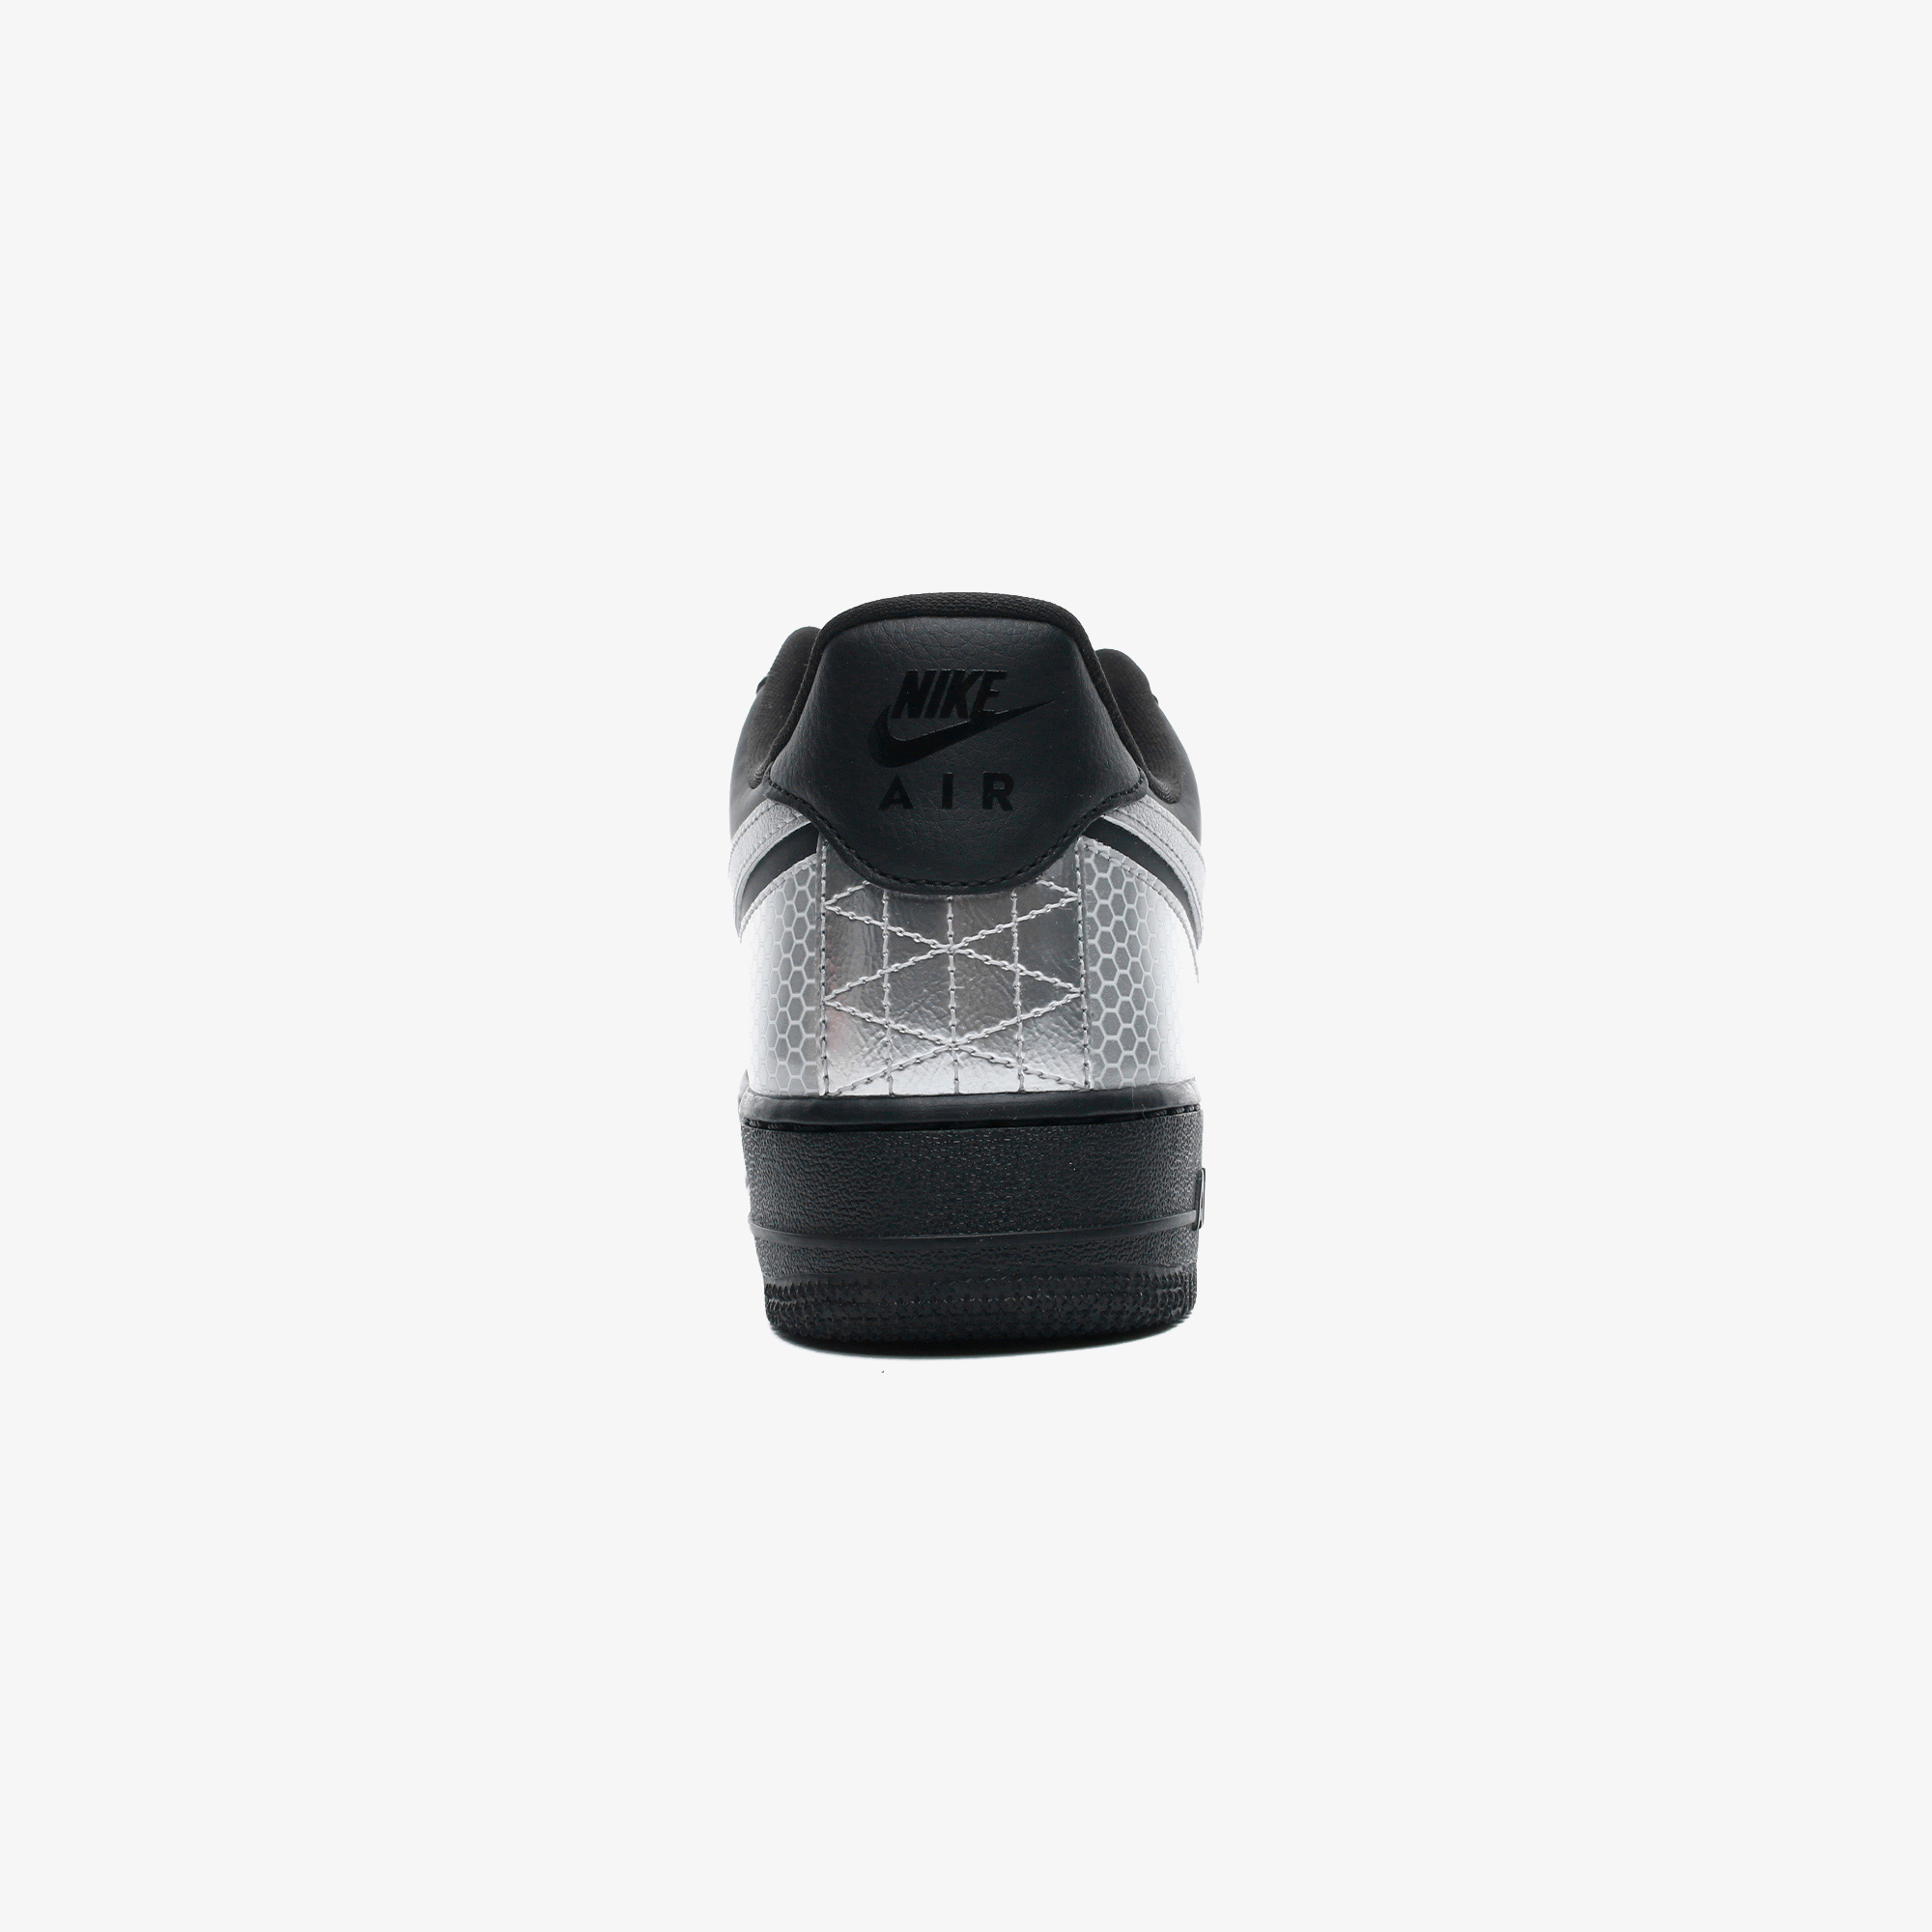 Air Force 1 '07 LV8 3M Erkek Siyah Spor Ayakkabı